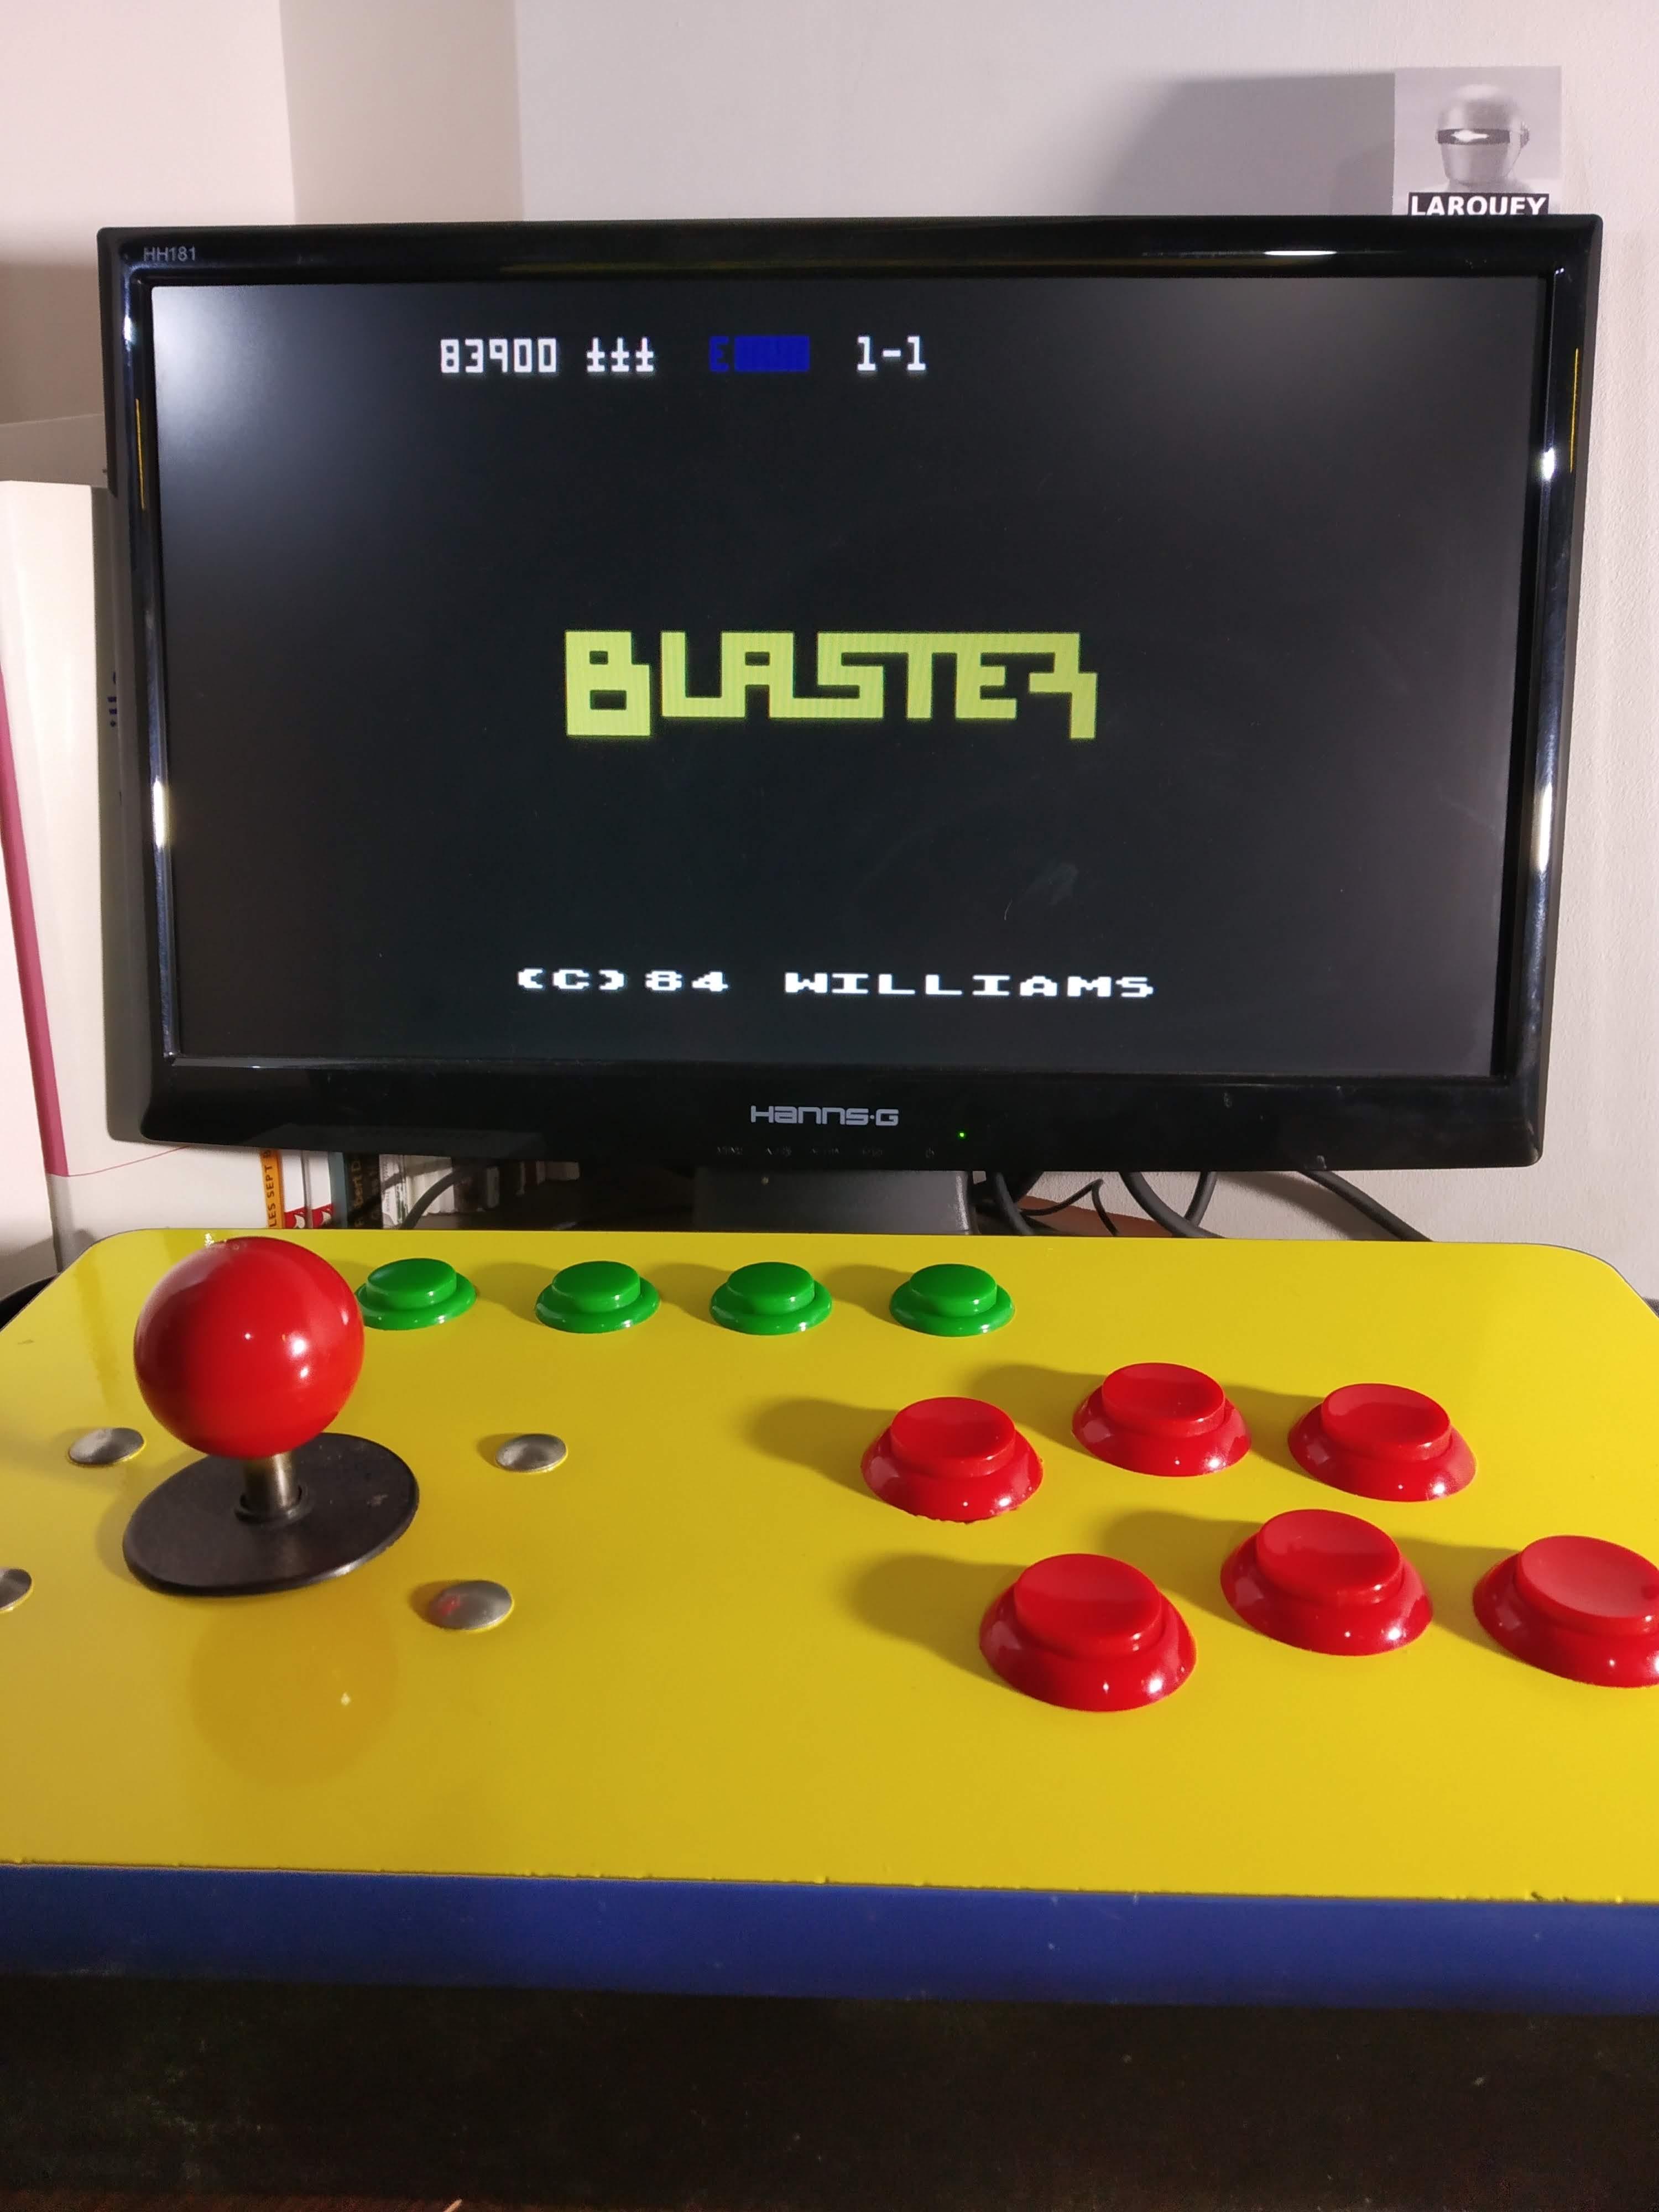 Larquey: Blaster [Start 1-1] (Atari 400/800/XL/XE Emulated) 83,900 points on 2019-12-09 11:55:11